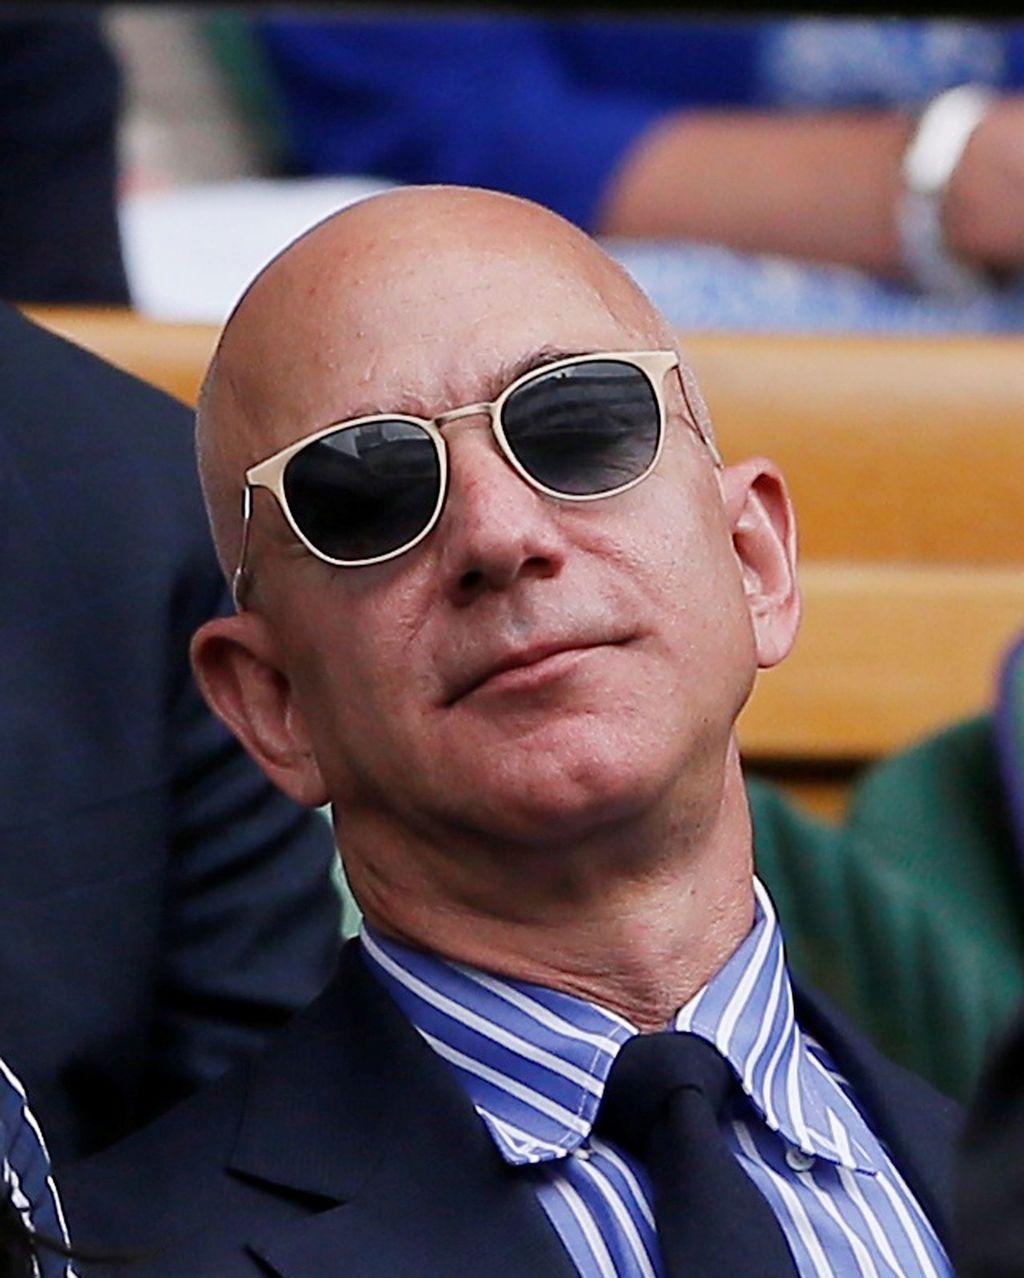 Jeff Bezos sang pemilik Amazon, tampil rapi dengan blazer dan kacamata hitam. Foto: Reuters